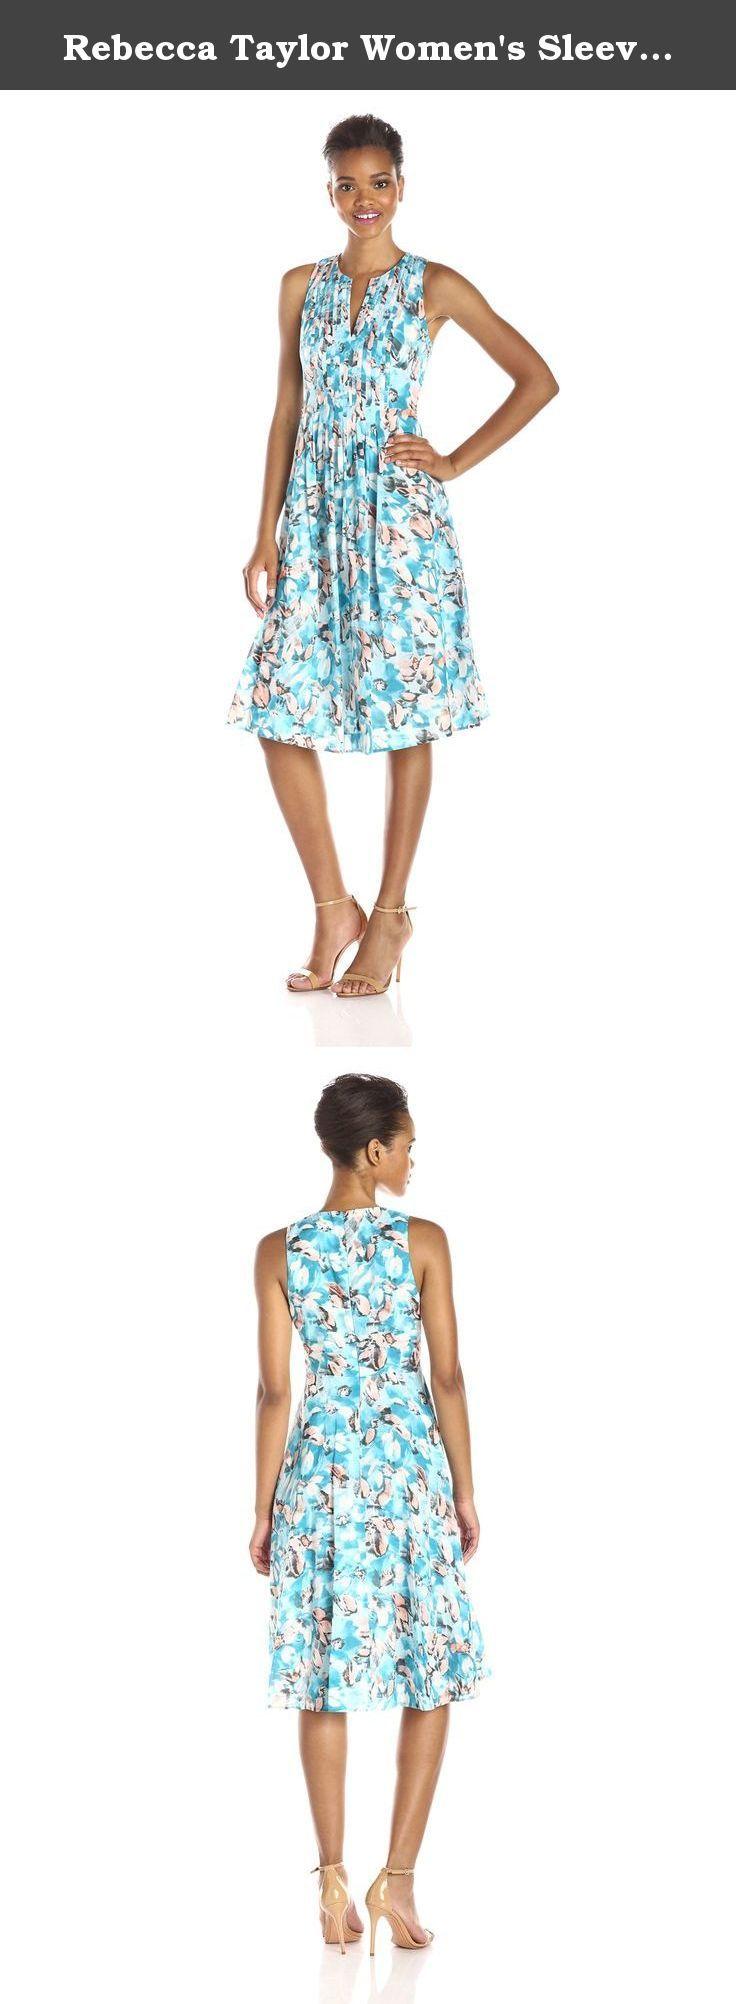 Rebecca Taylor Women's Sleeveless Aloha Pin Tuck Dress, Poolside, 0. Aloha pin tuck dress.